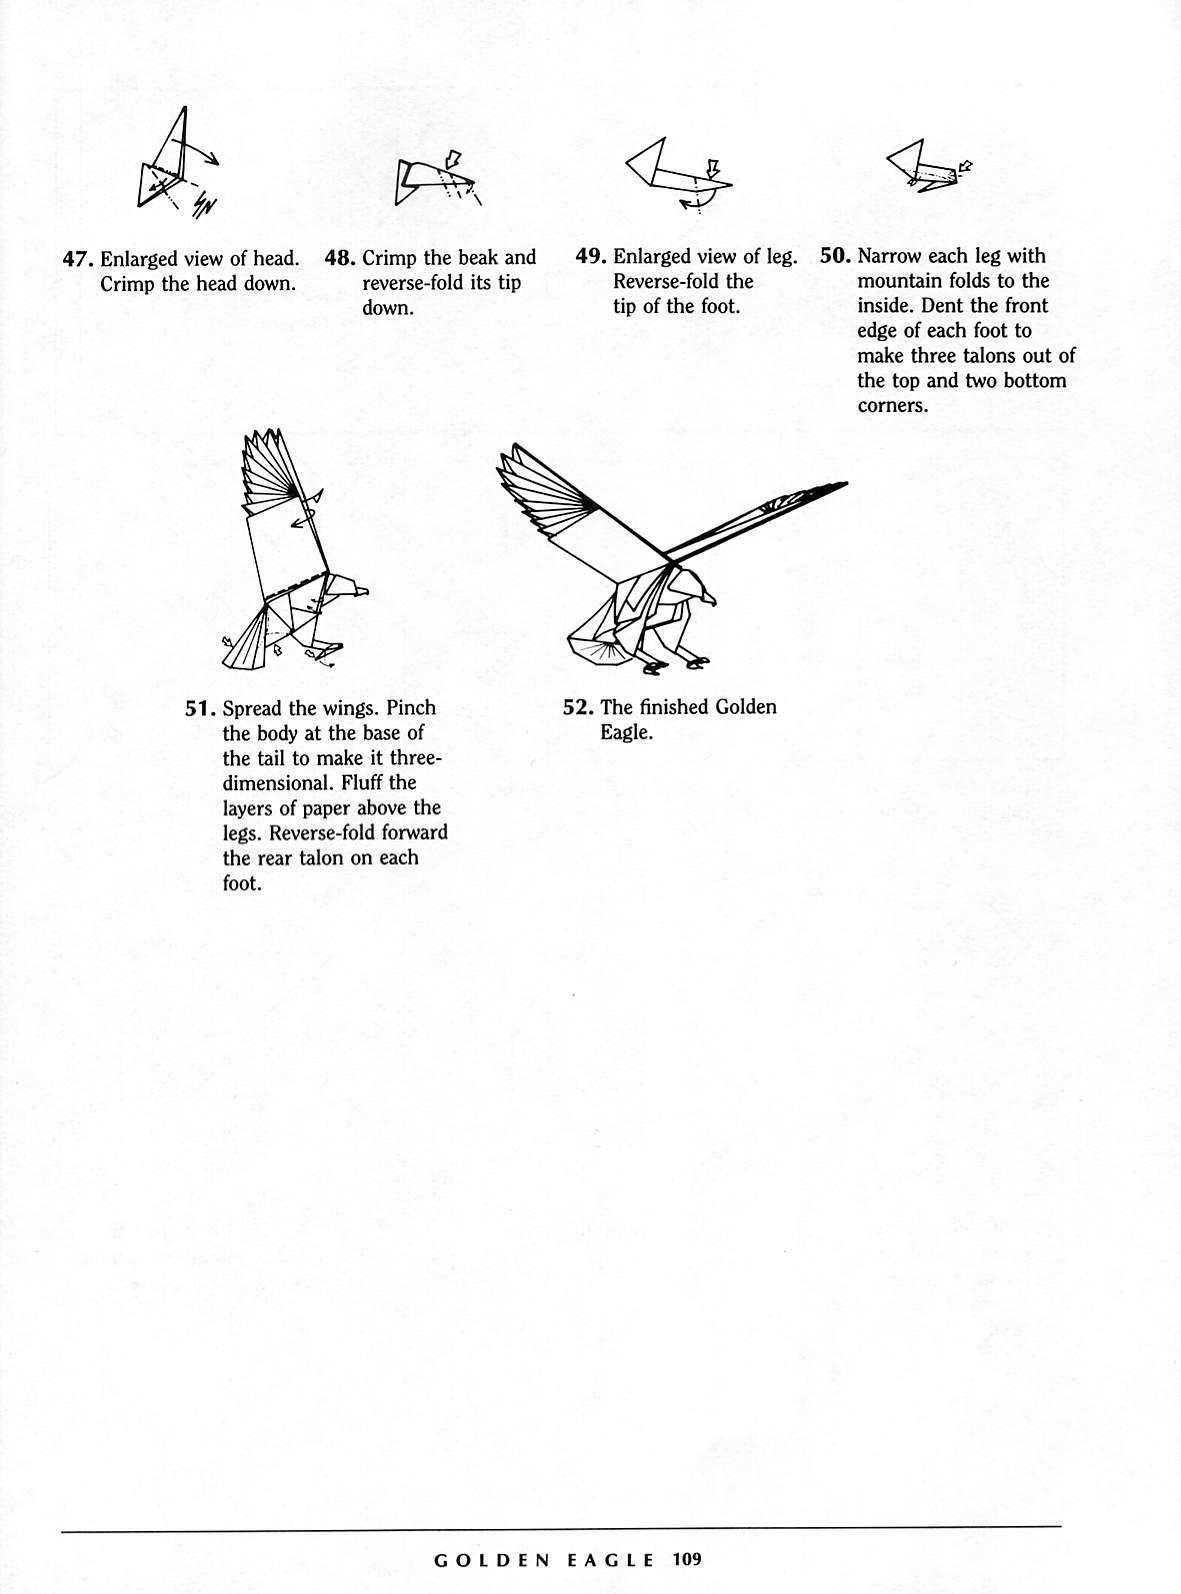 Origami Eagle Instructions Diagram How Do You Make A Contoh Brosur Obat Herbal Downlllll